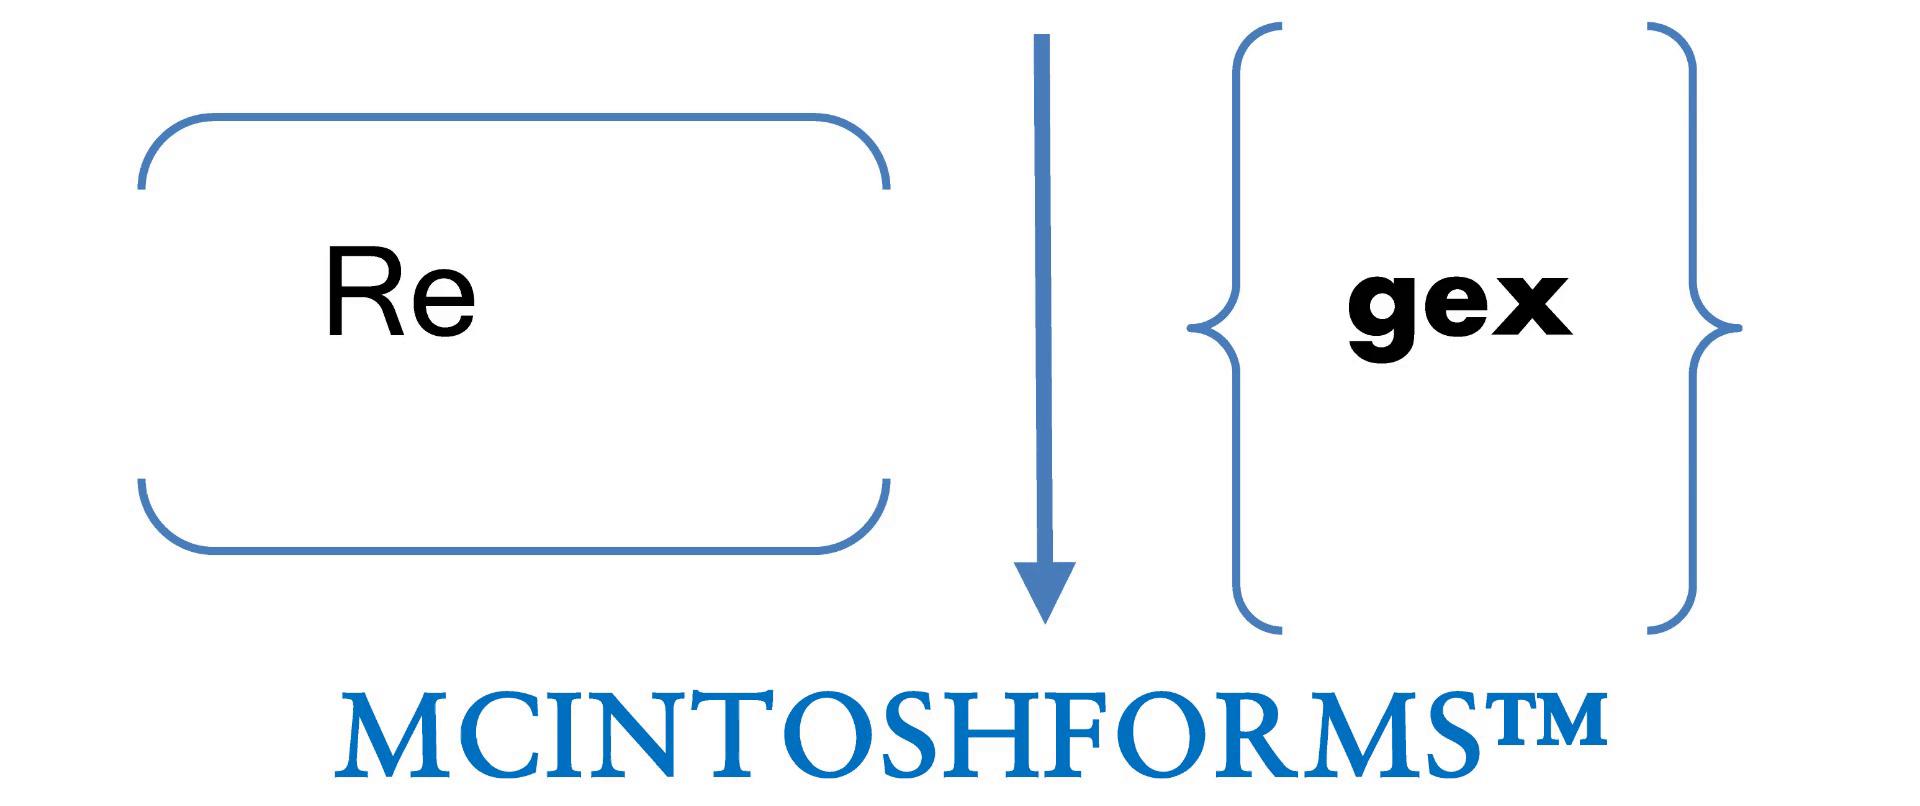 MCINTOSHFORMS™ Elemental Editing Solutions